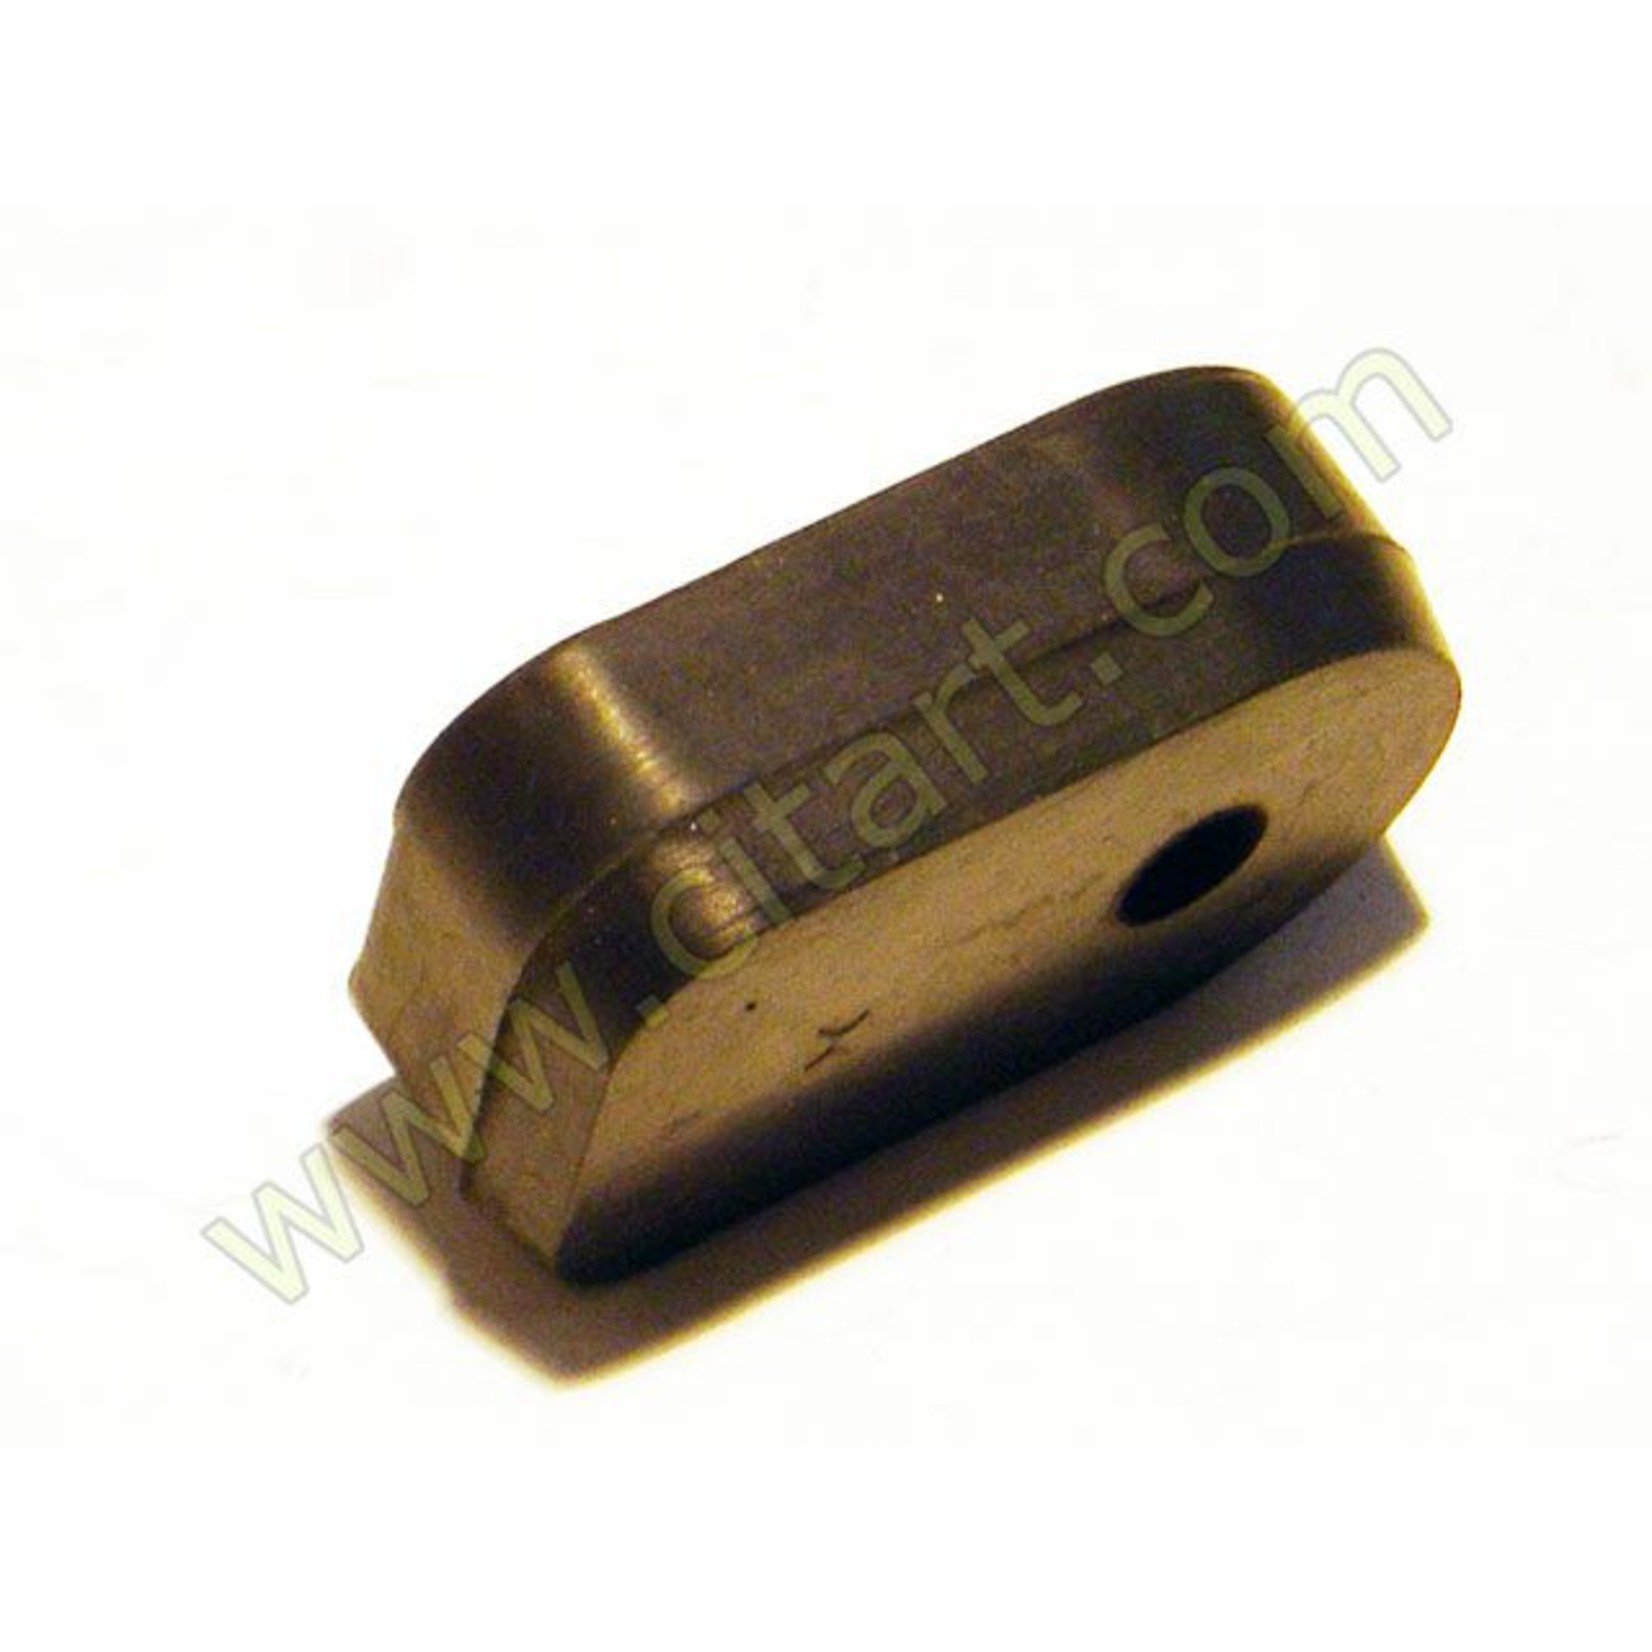 Rubberblok radiateur 66- Nr Org: DX23296